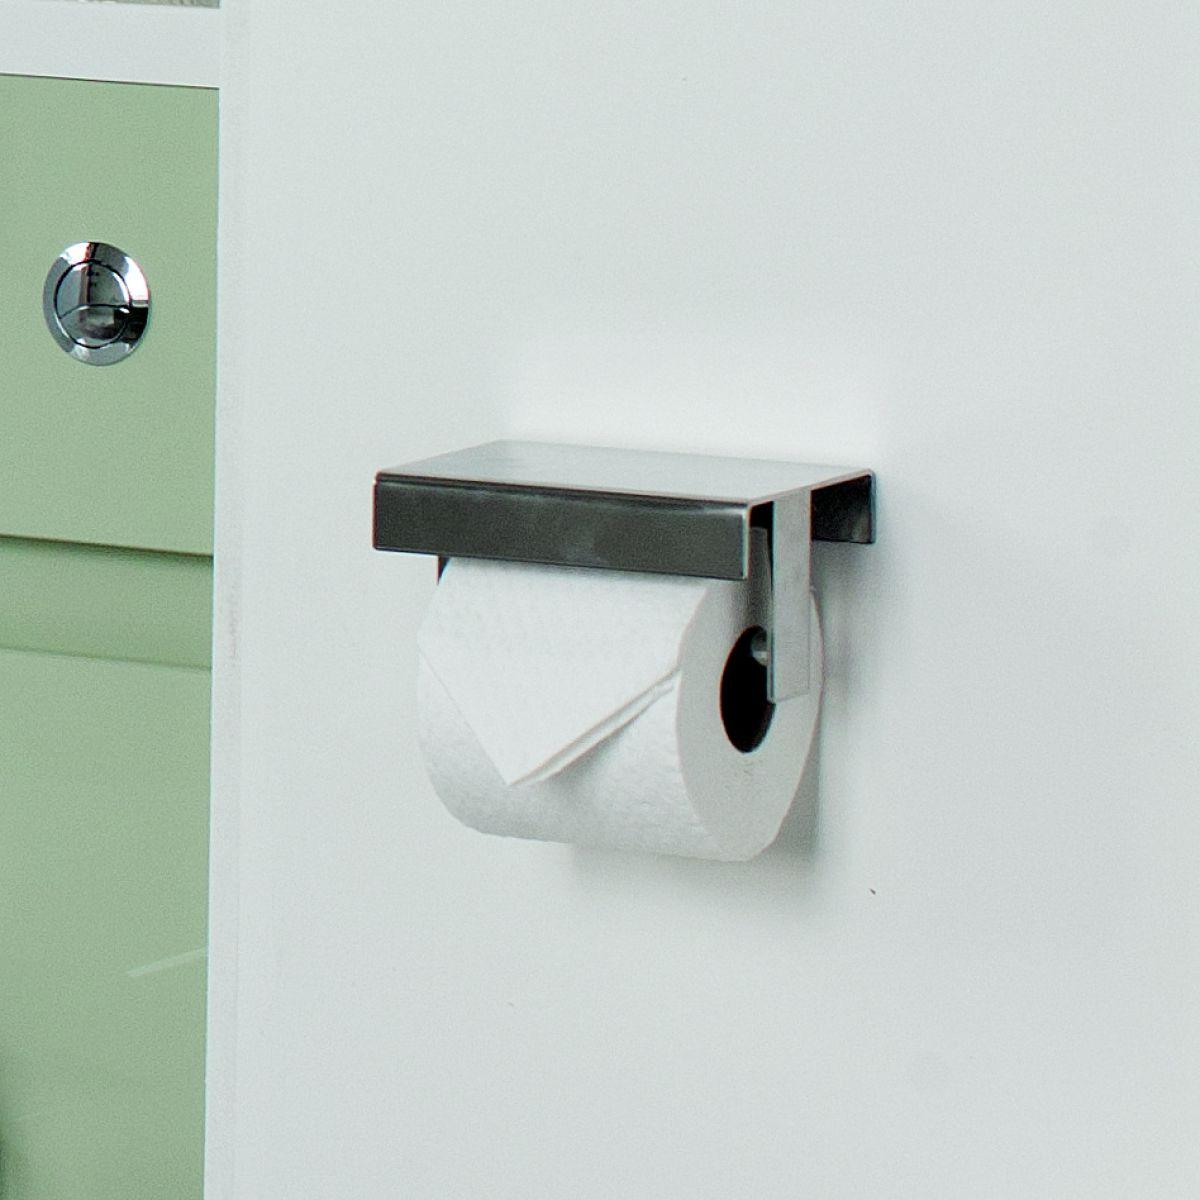 Stainless Steel Toilet Roll Holder Part - 35: Britton Stainless Steel Toilet Roll Holder